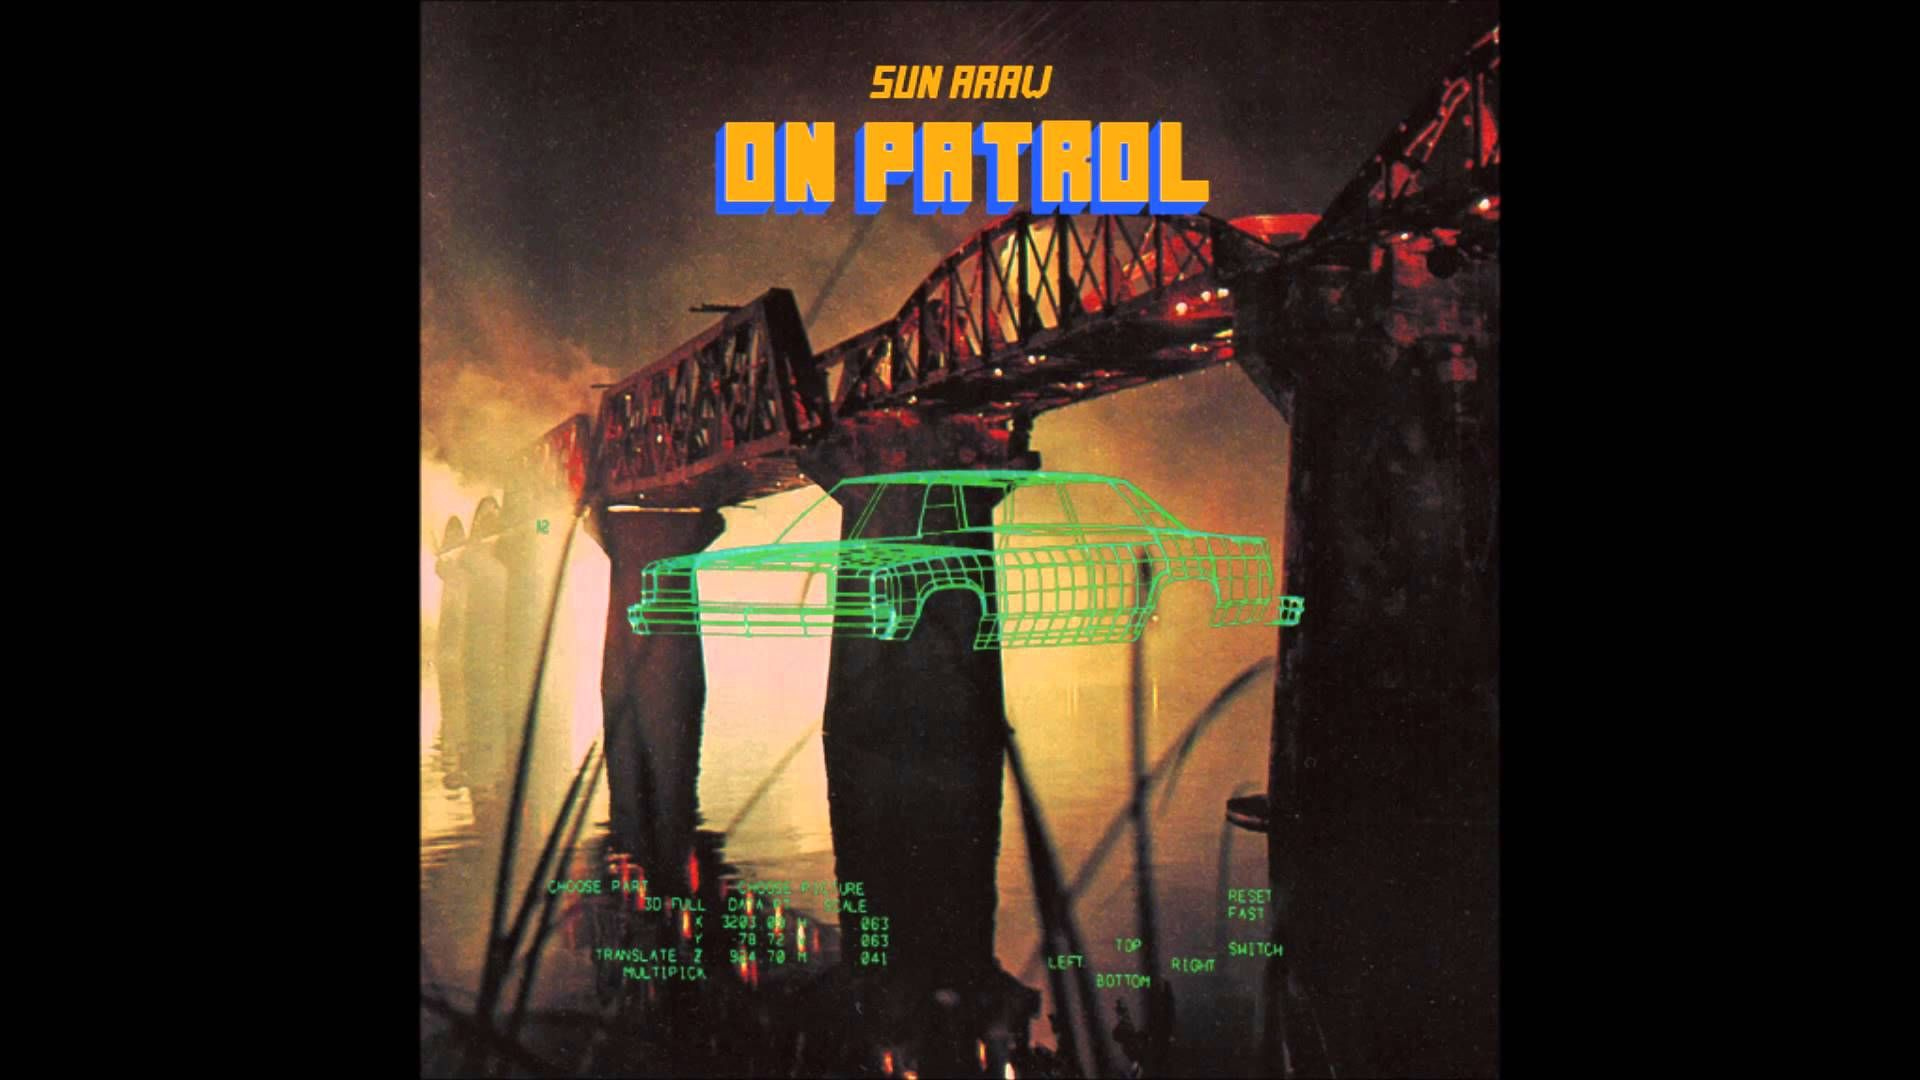 Sun Araw On Patrol Full Album Sounds